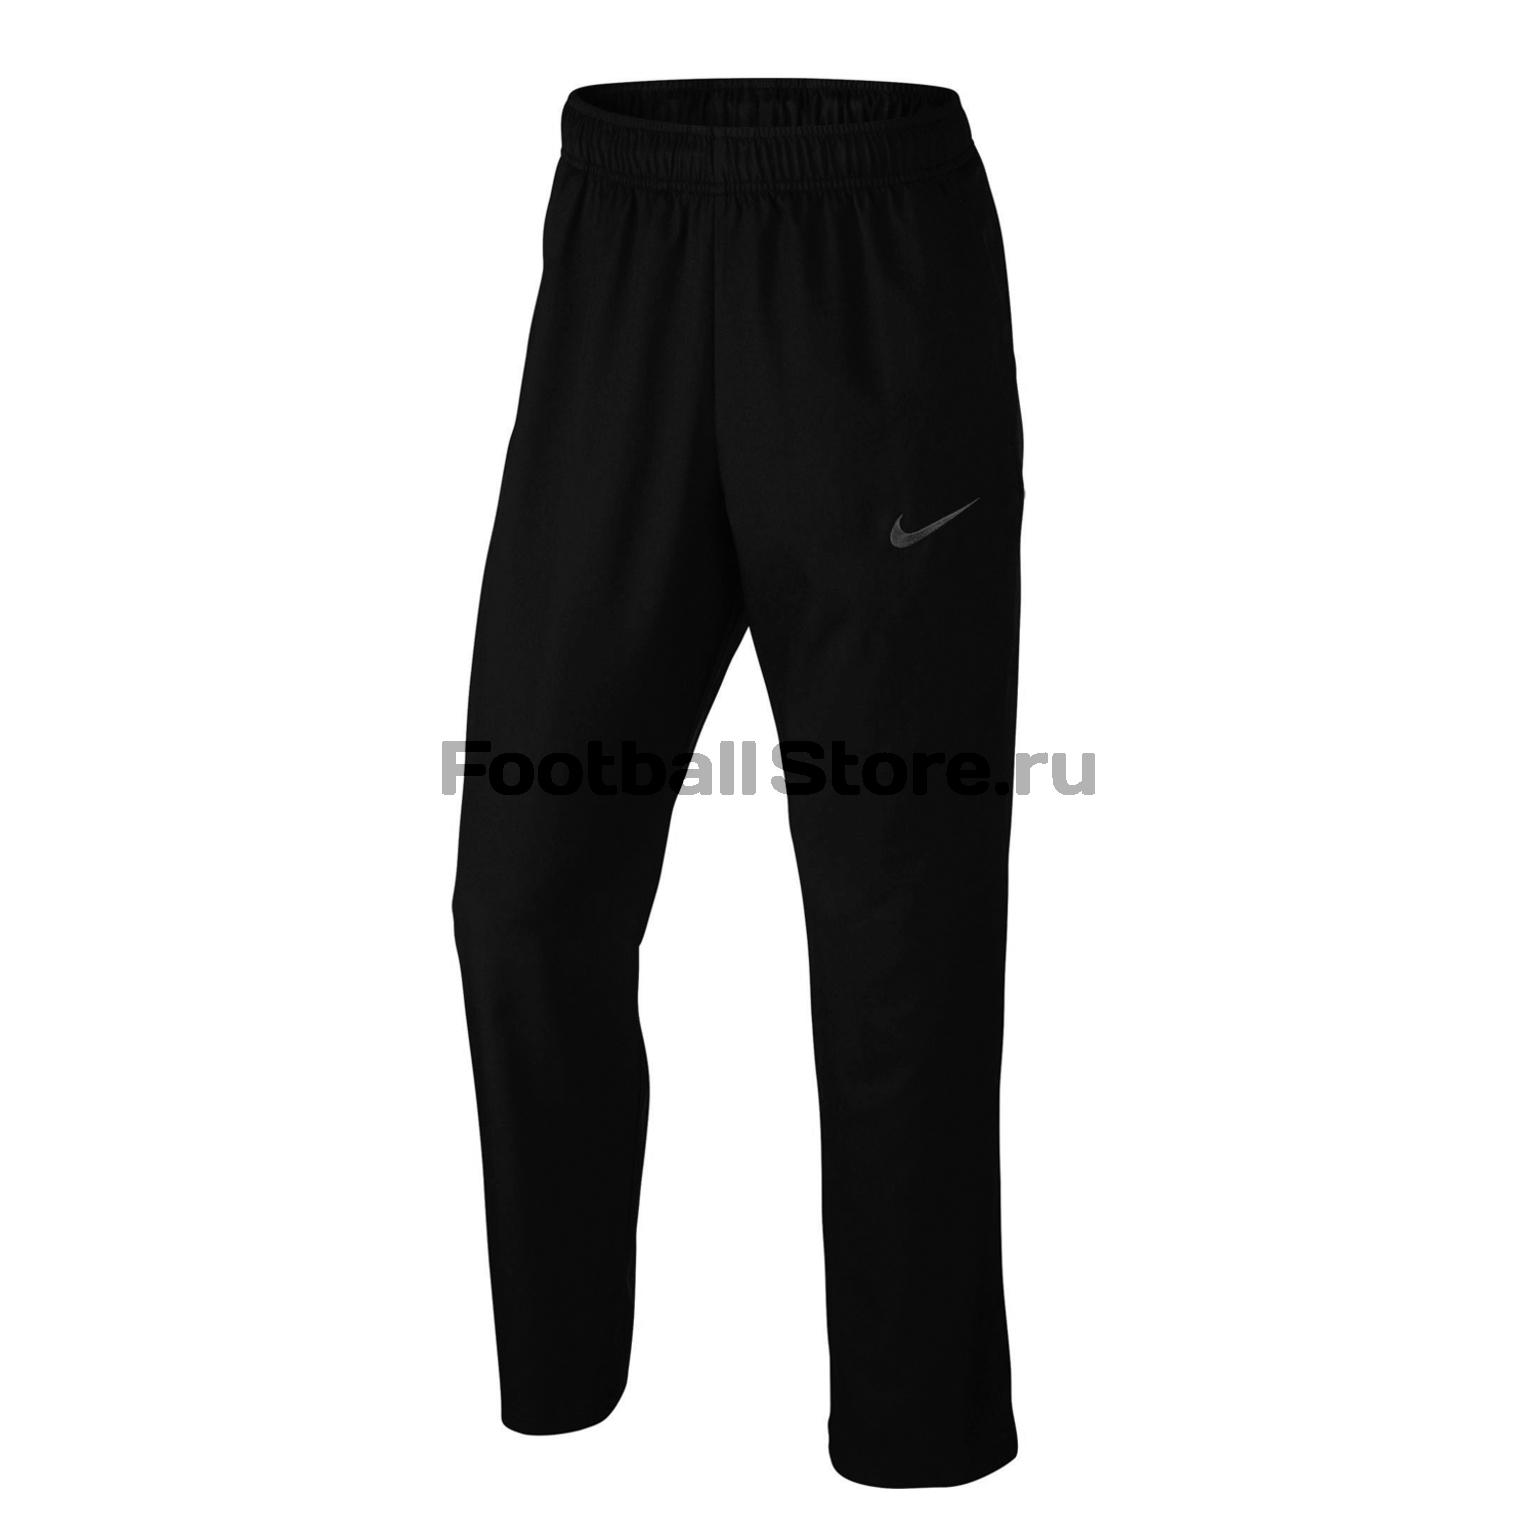 Брюки тренировочные Nike Dry Pant Team Woven 800201-010 куртка nike dry team woven 800199 021